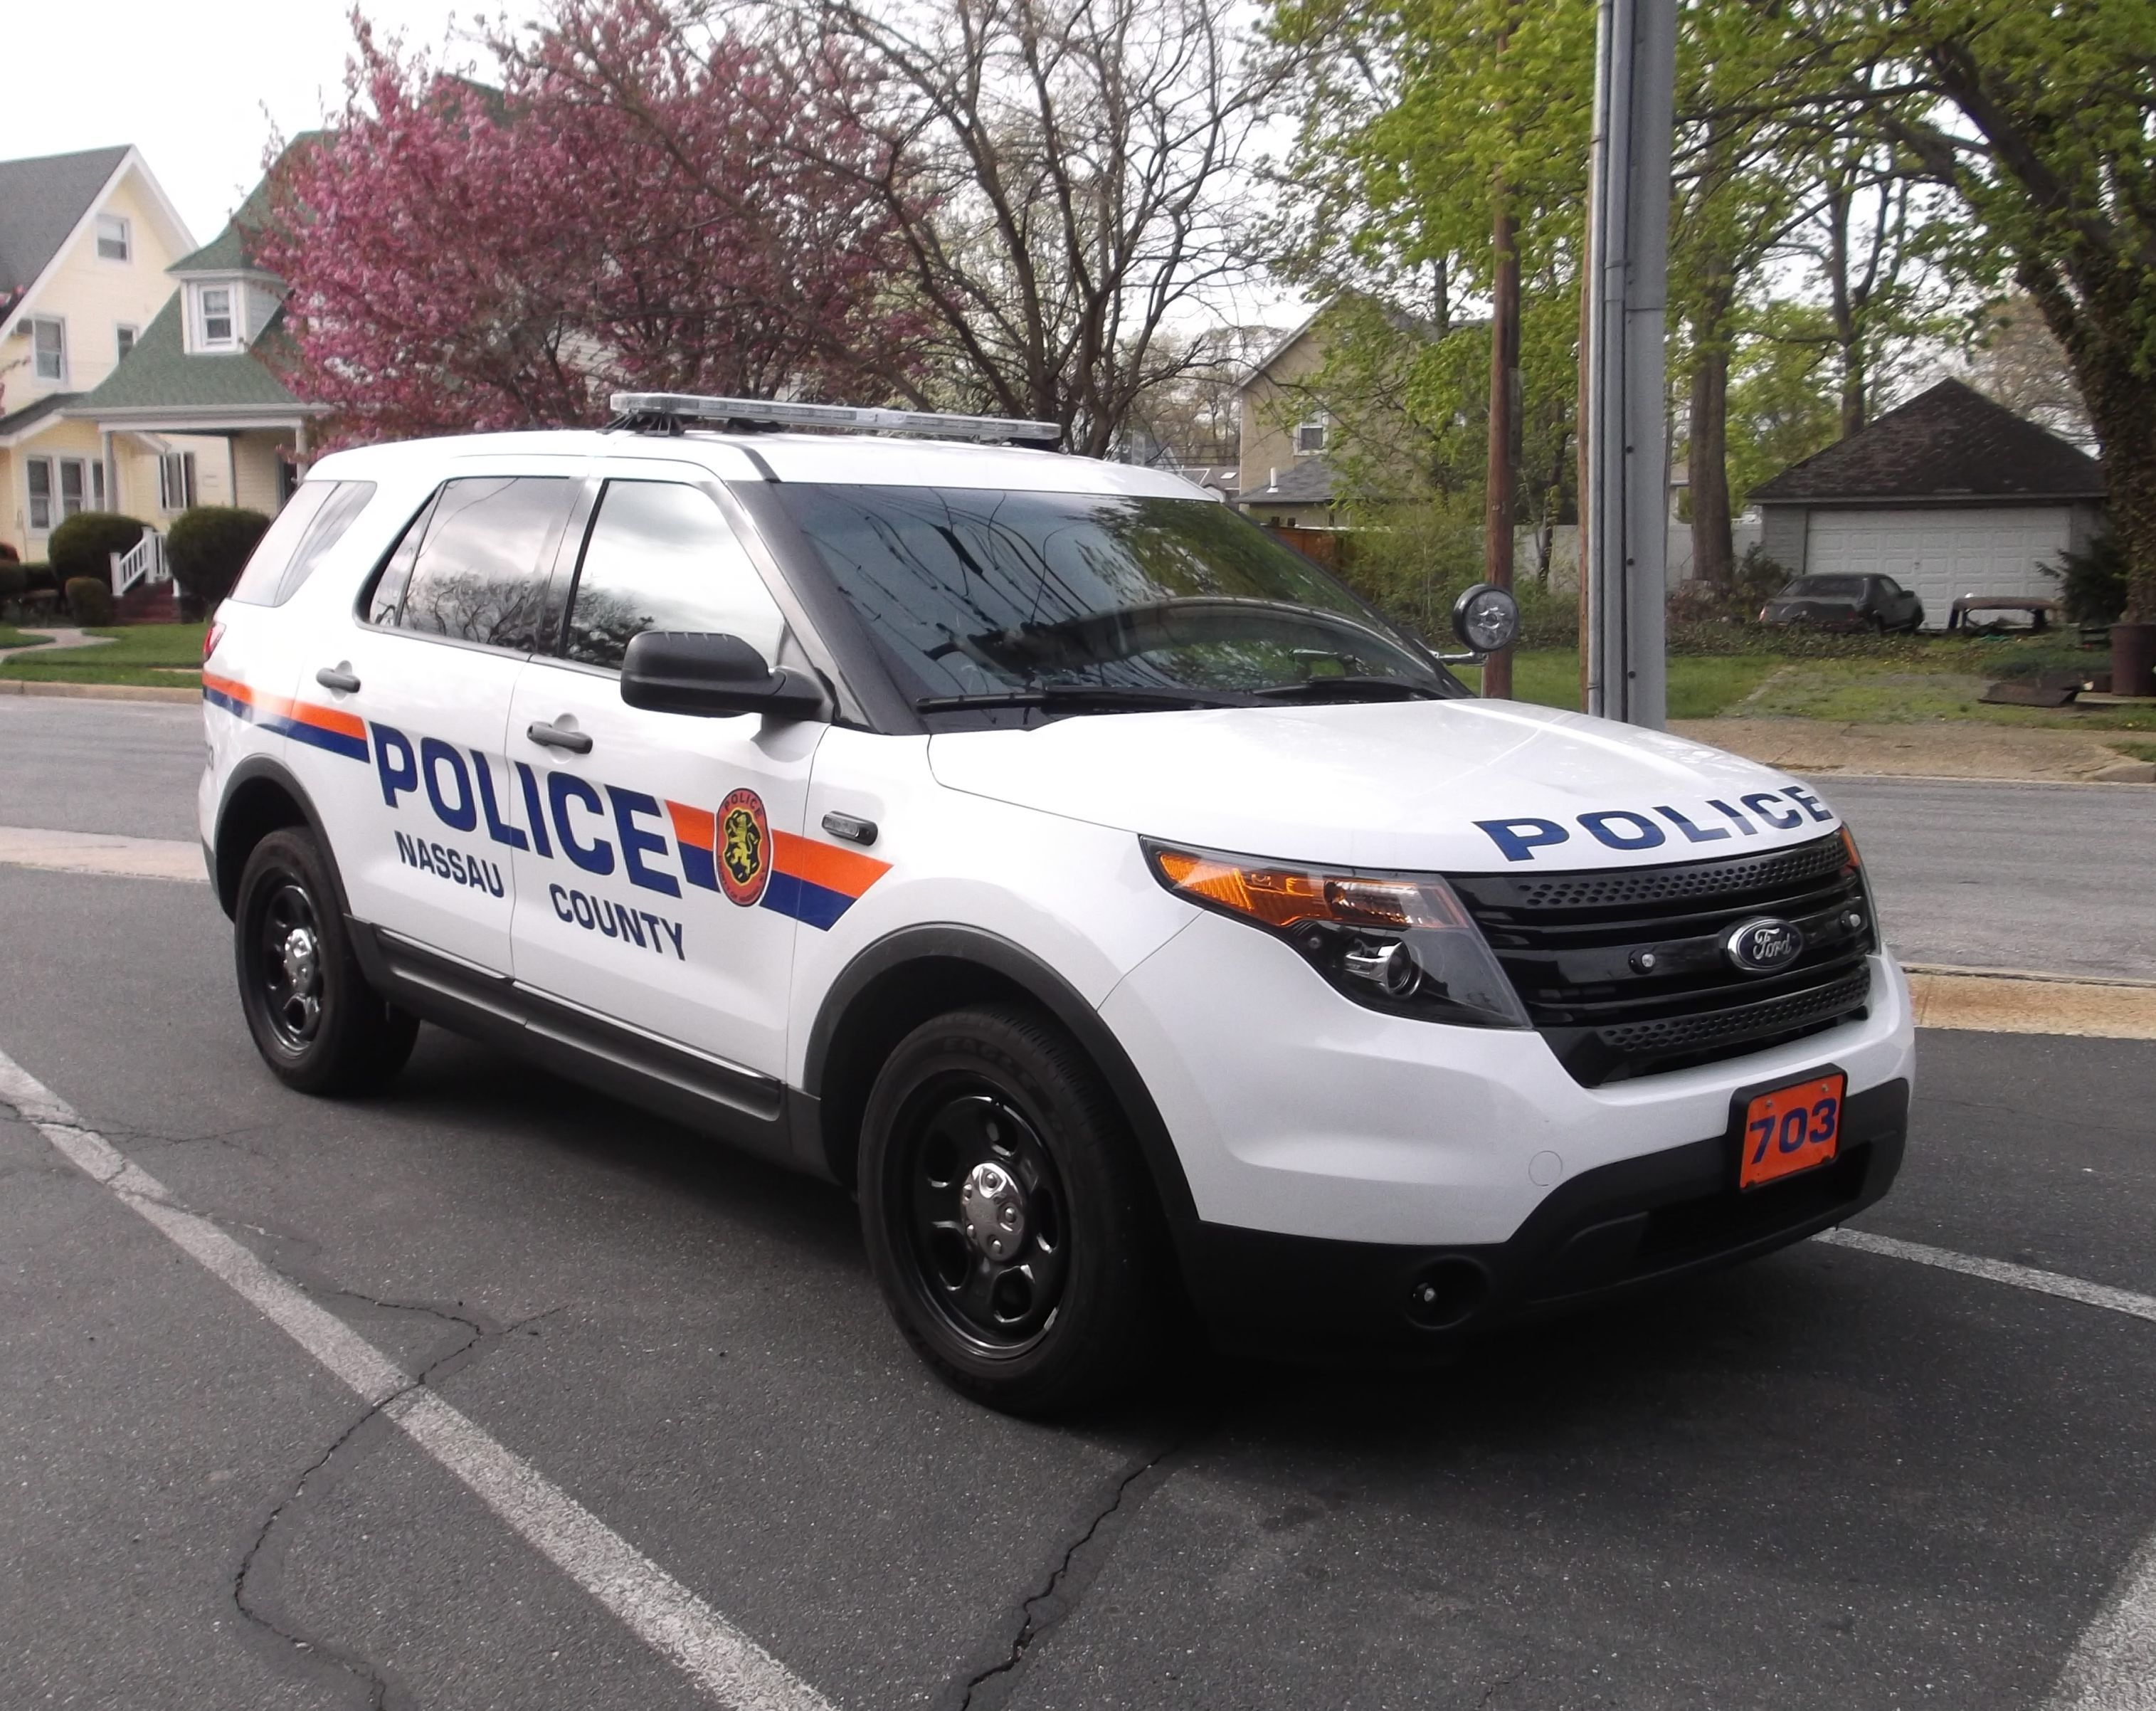 newyork nassau county police ford interceptor utility vehicle new york pinterest nassau. Black Bedroom Furniture Sets. Home Design Ideas